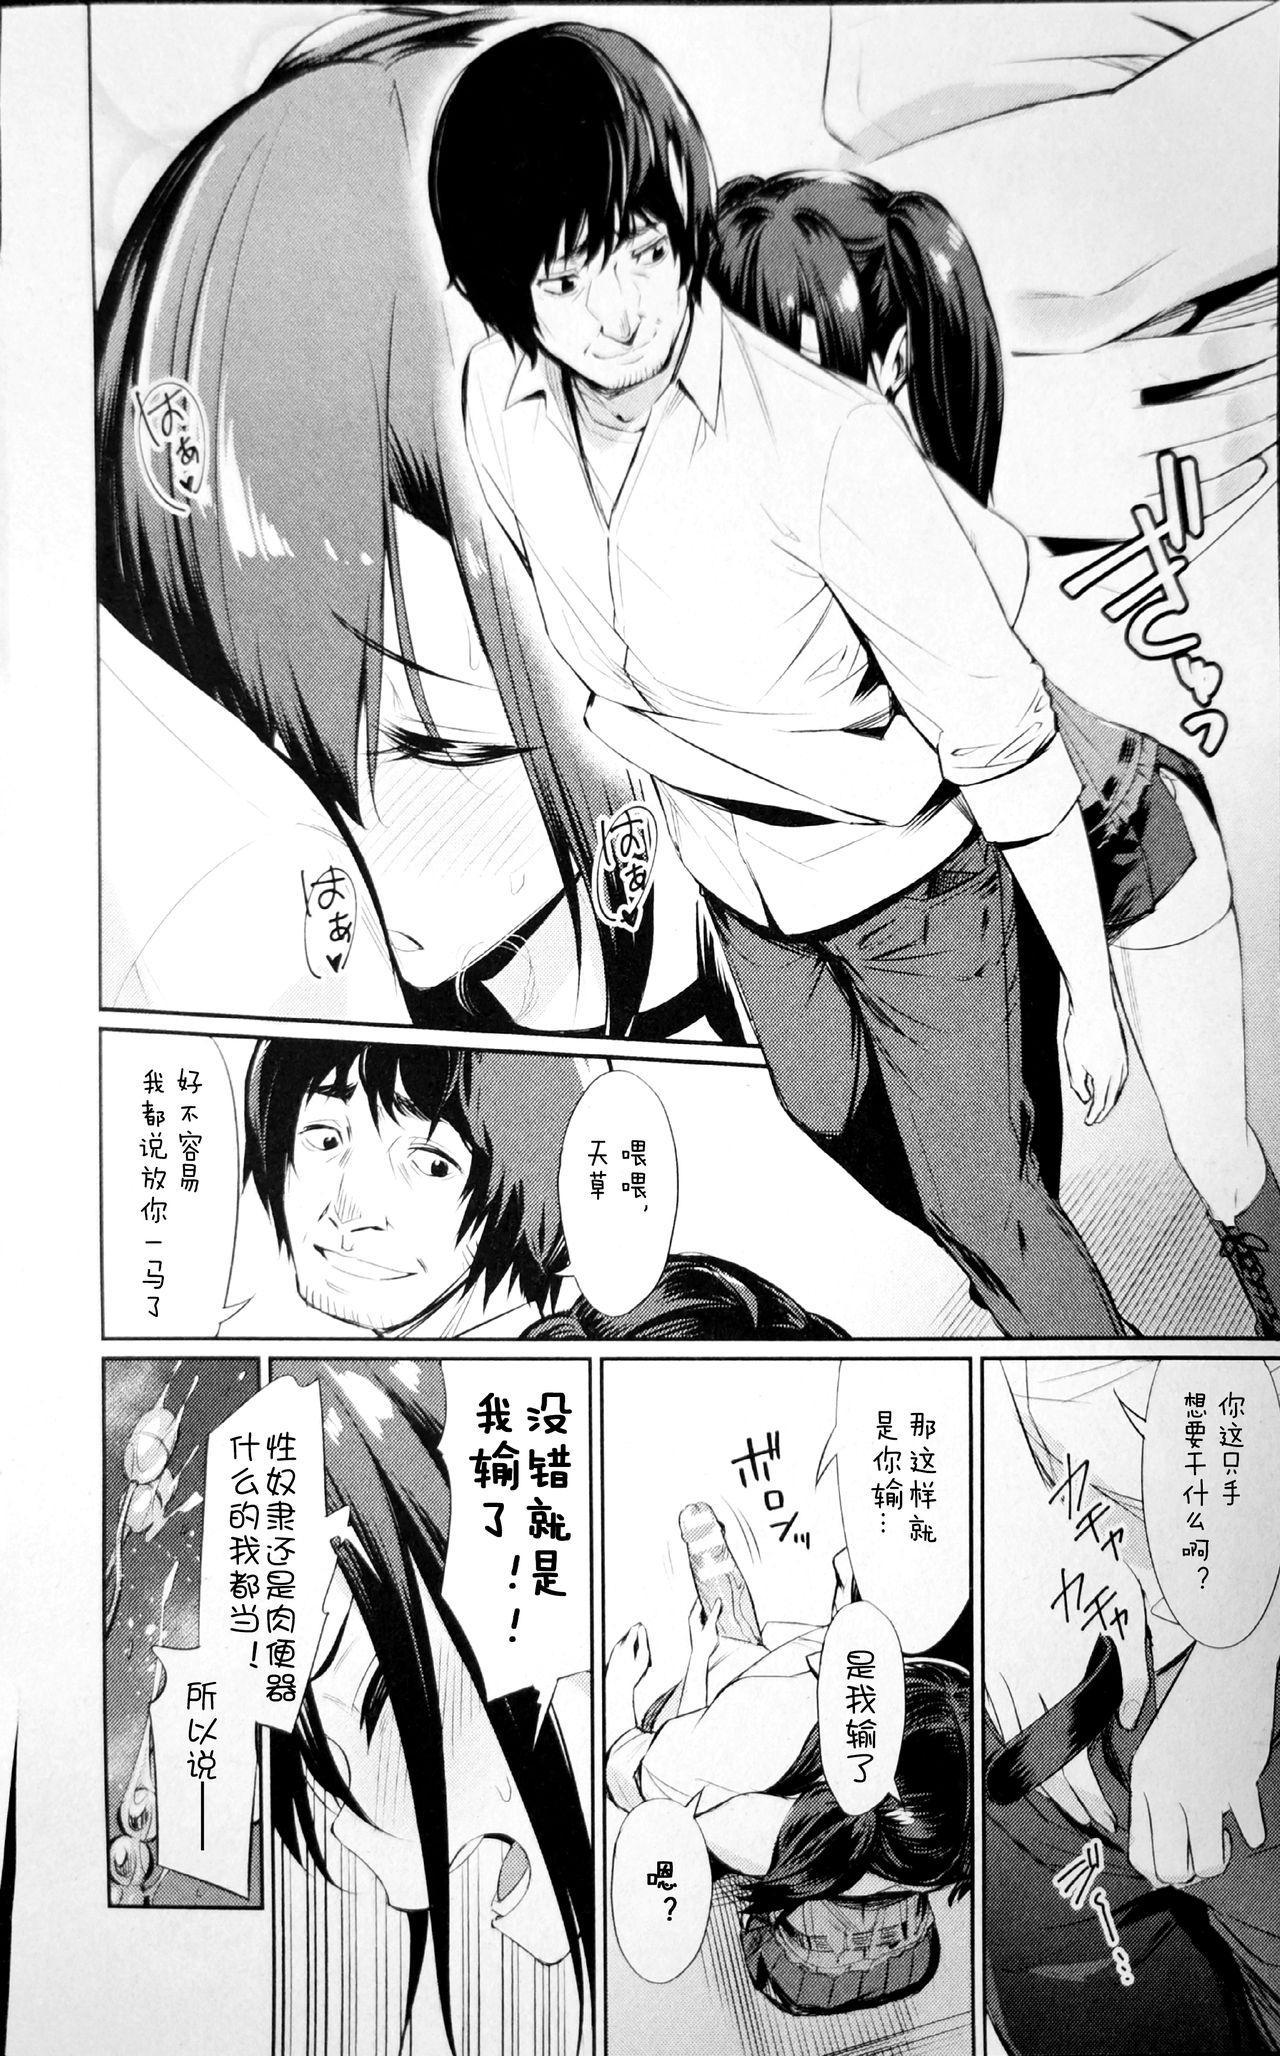 [yasu]Saimin Gakusei Shidou ~Amagusa Nao no Baai~Kouhen2 (COMIC Unreal 2020-04 Vol. 84) [Chinese] 3